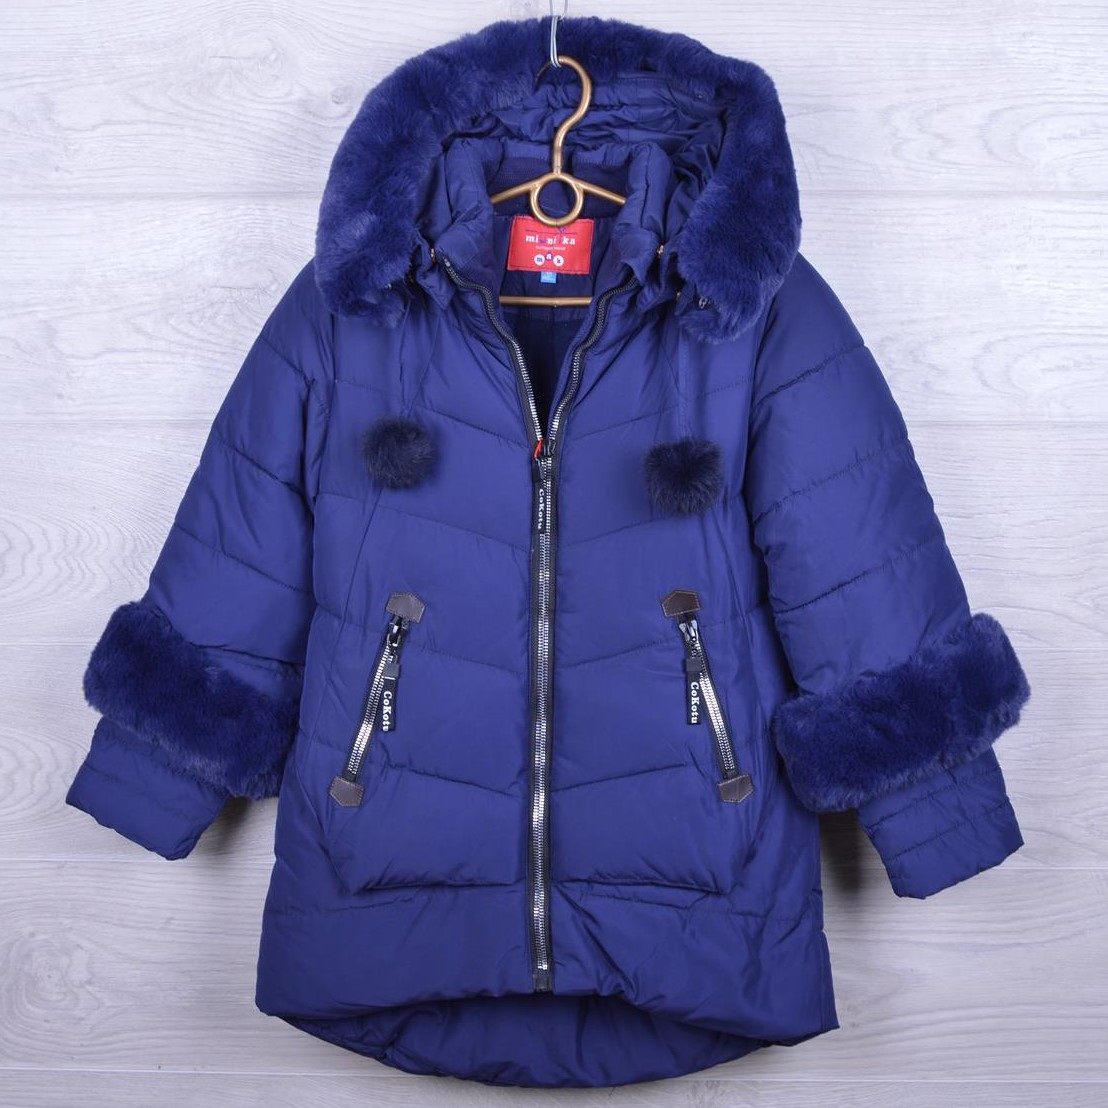 cda1edecc5d Куртка подростковая зимняя